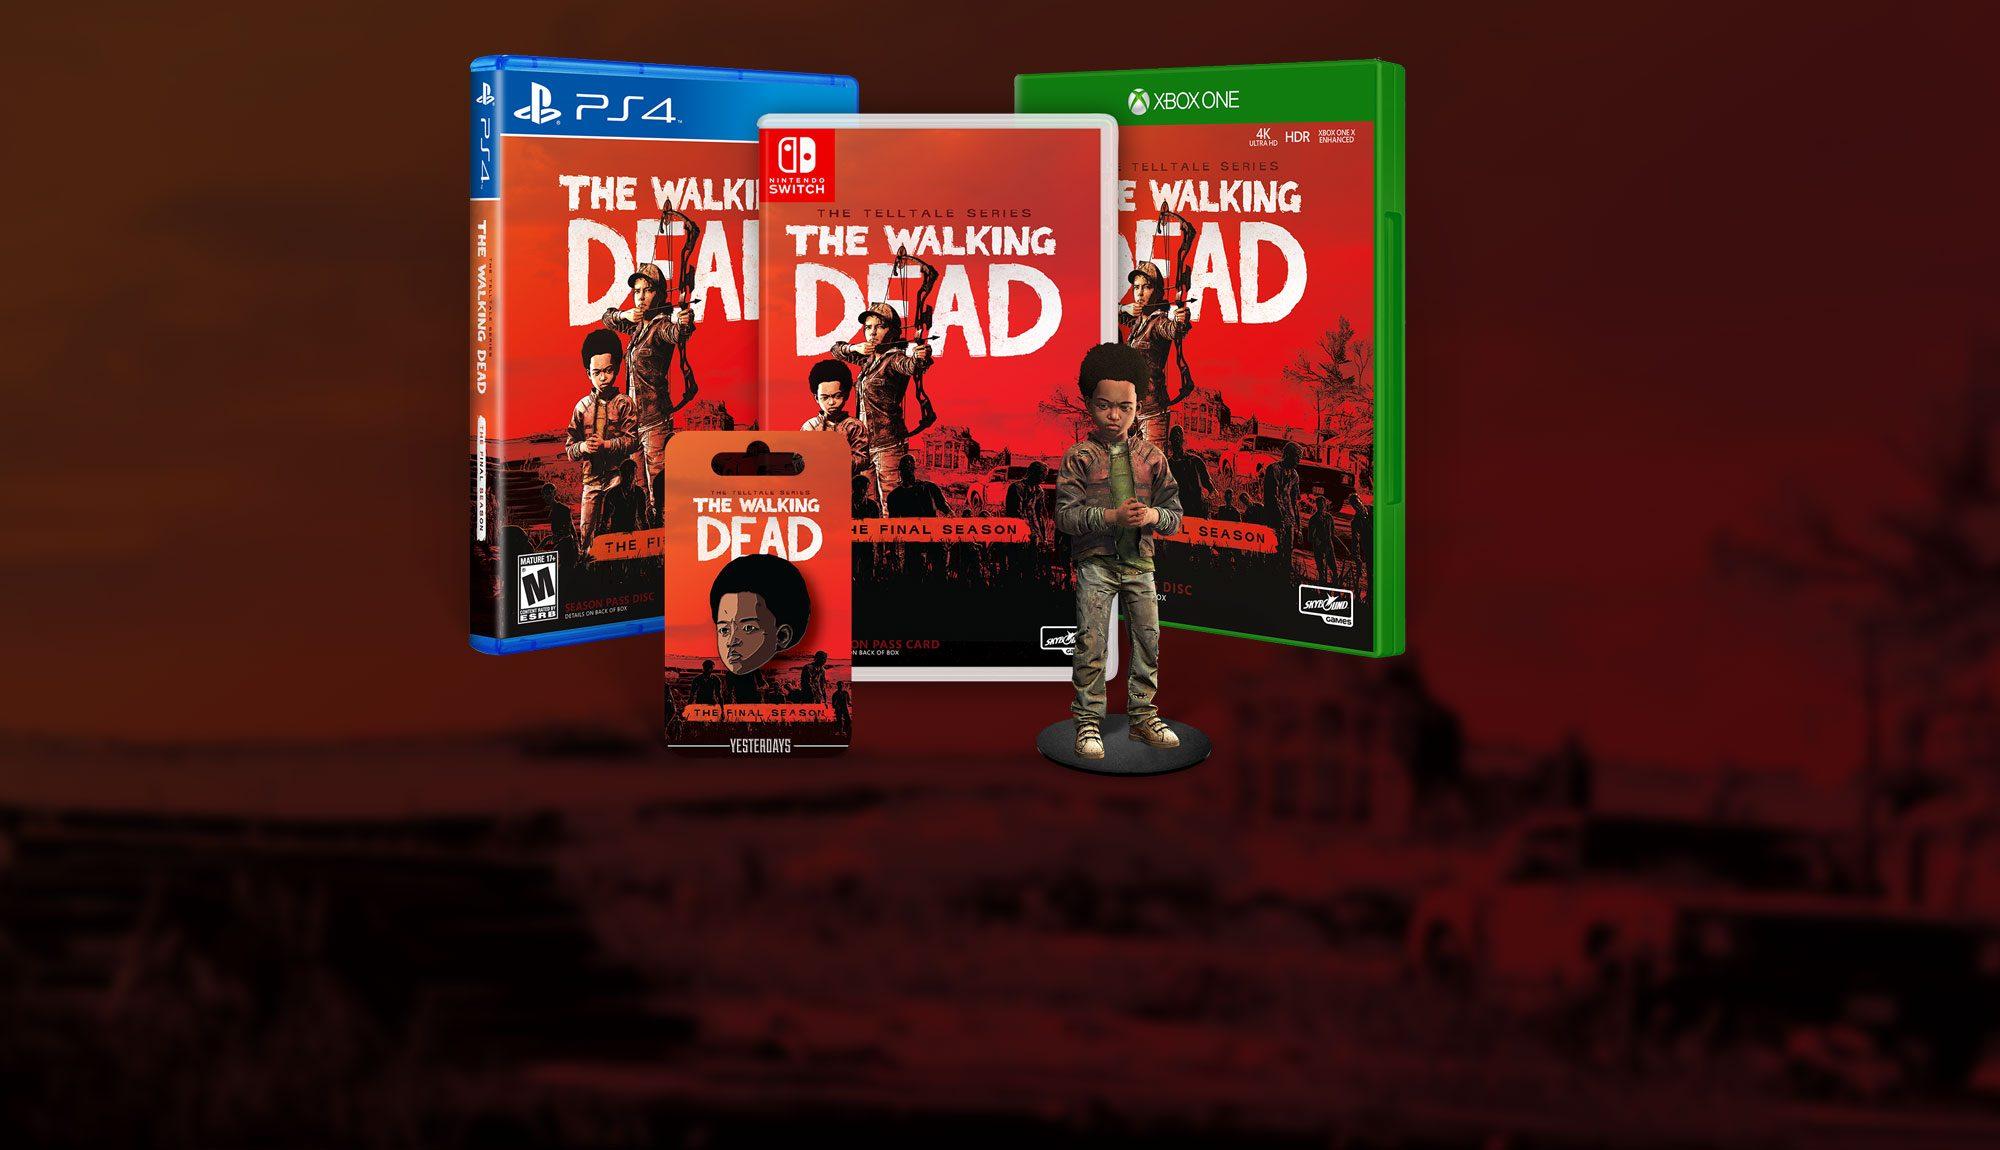 Telltale's The Walking Dead The Final Season Collector's